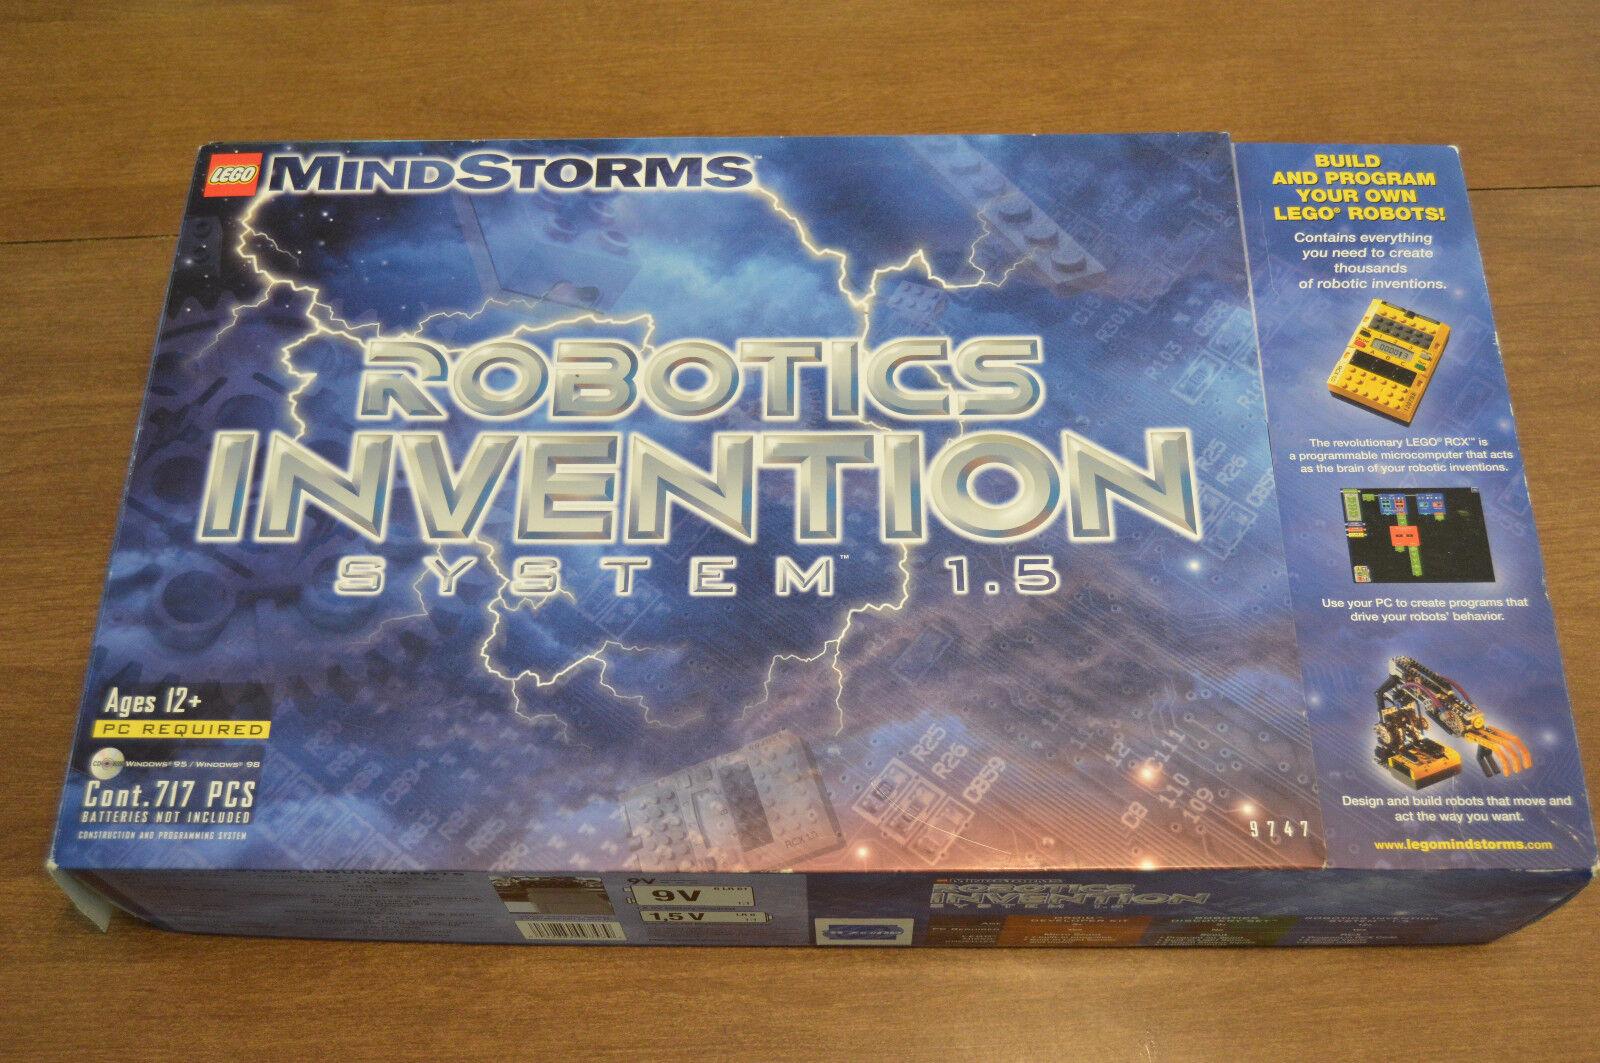 Lego Mindstorms 9747 Robotics Invention System 1.5 Incomplete Parts Pieces